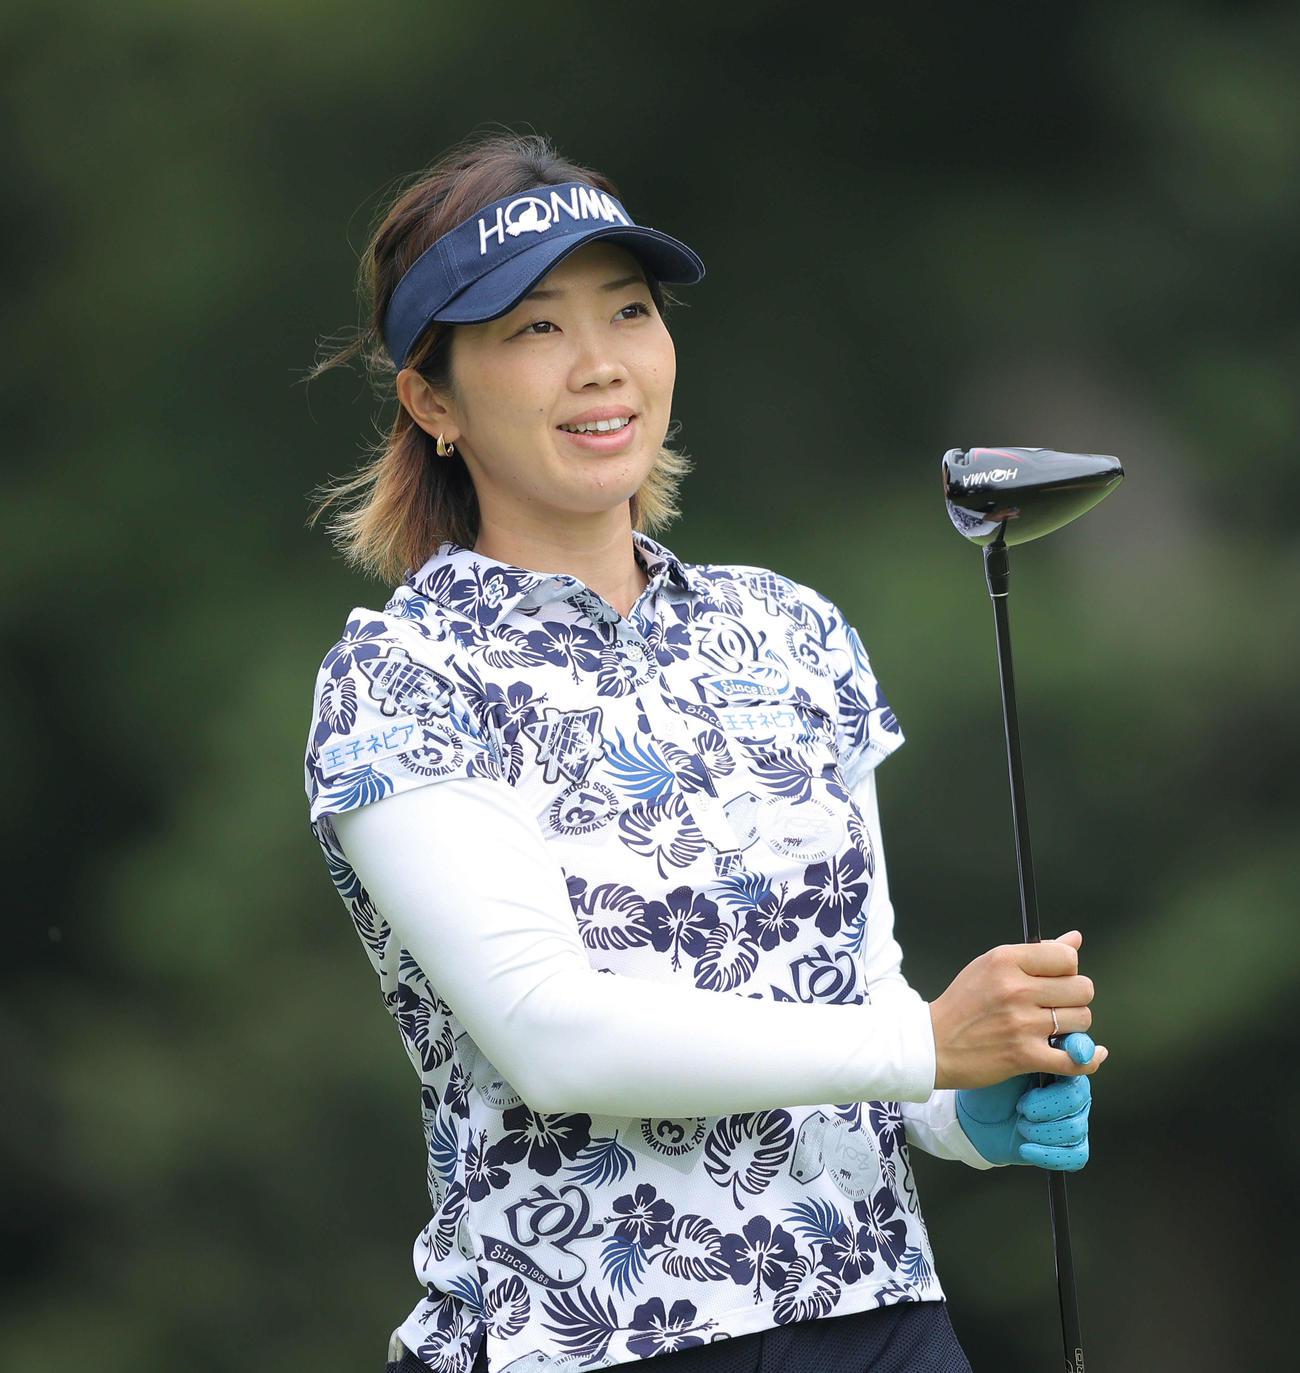 https://www.nikkansports.com/sports/golf/news/img/202106240000665-w1300_10.jpg